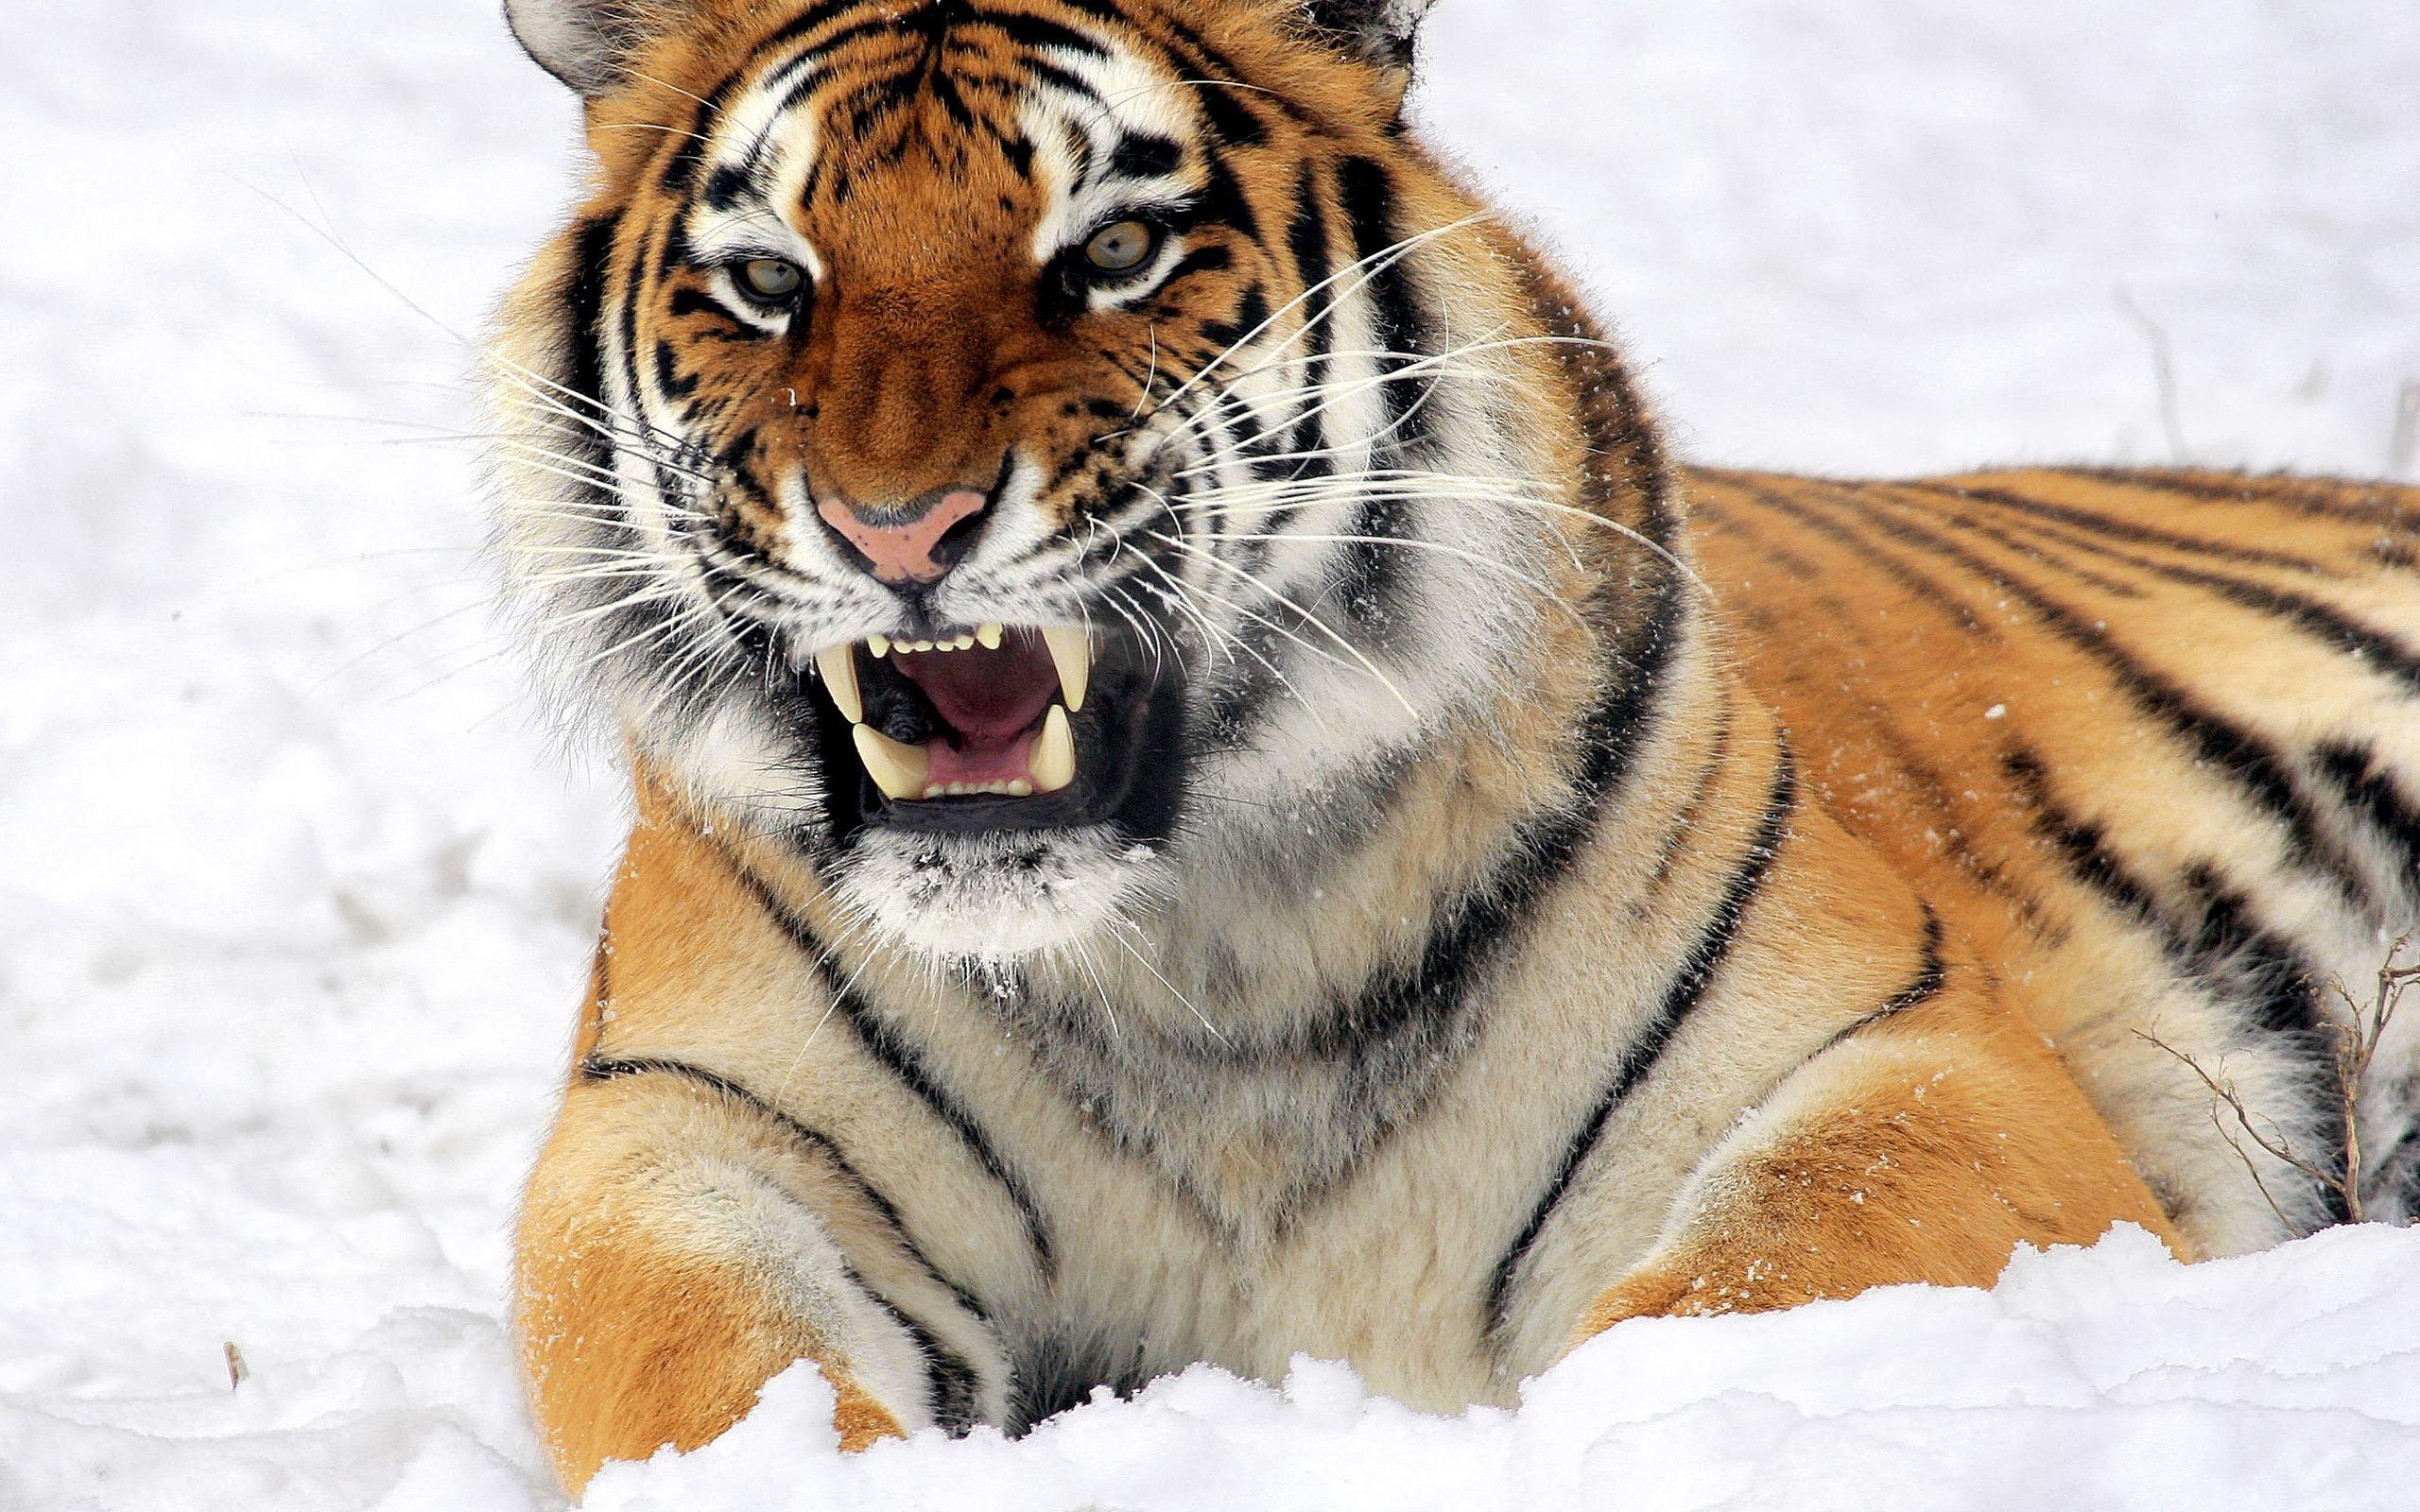 Fierce Tiger Wallpaper